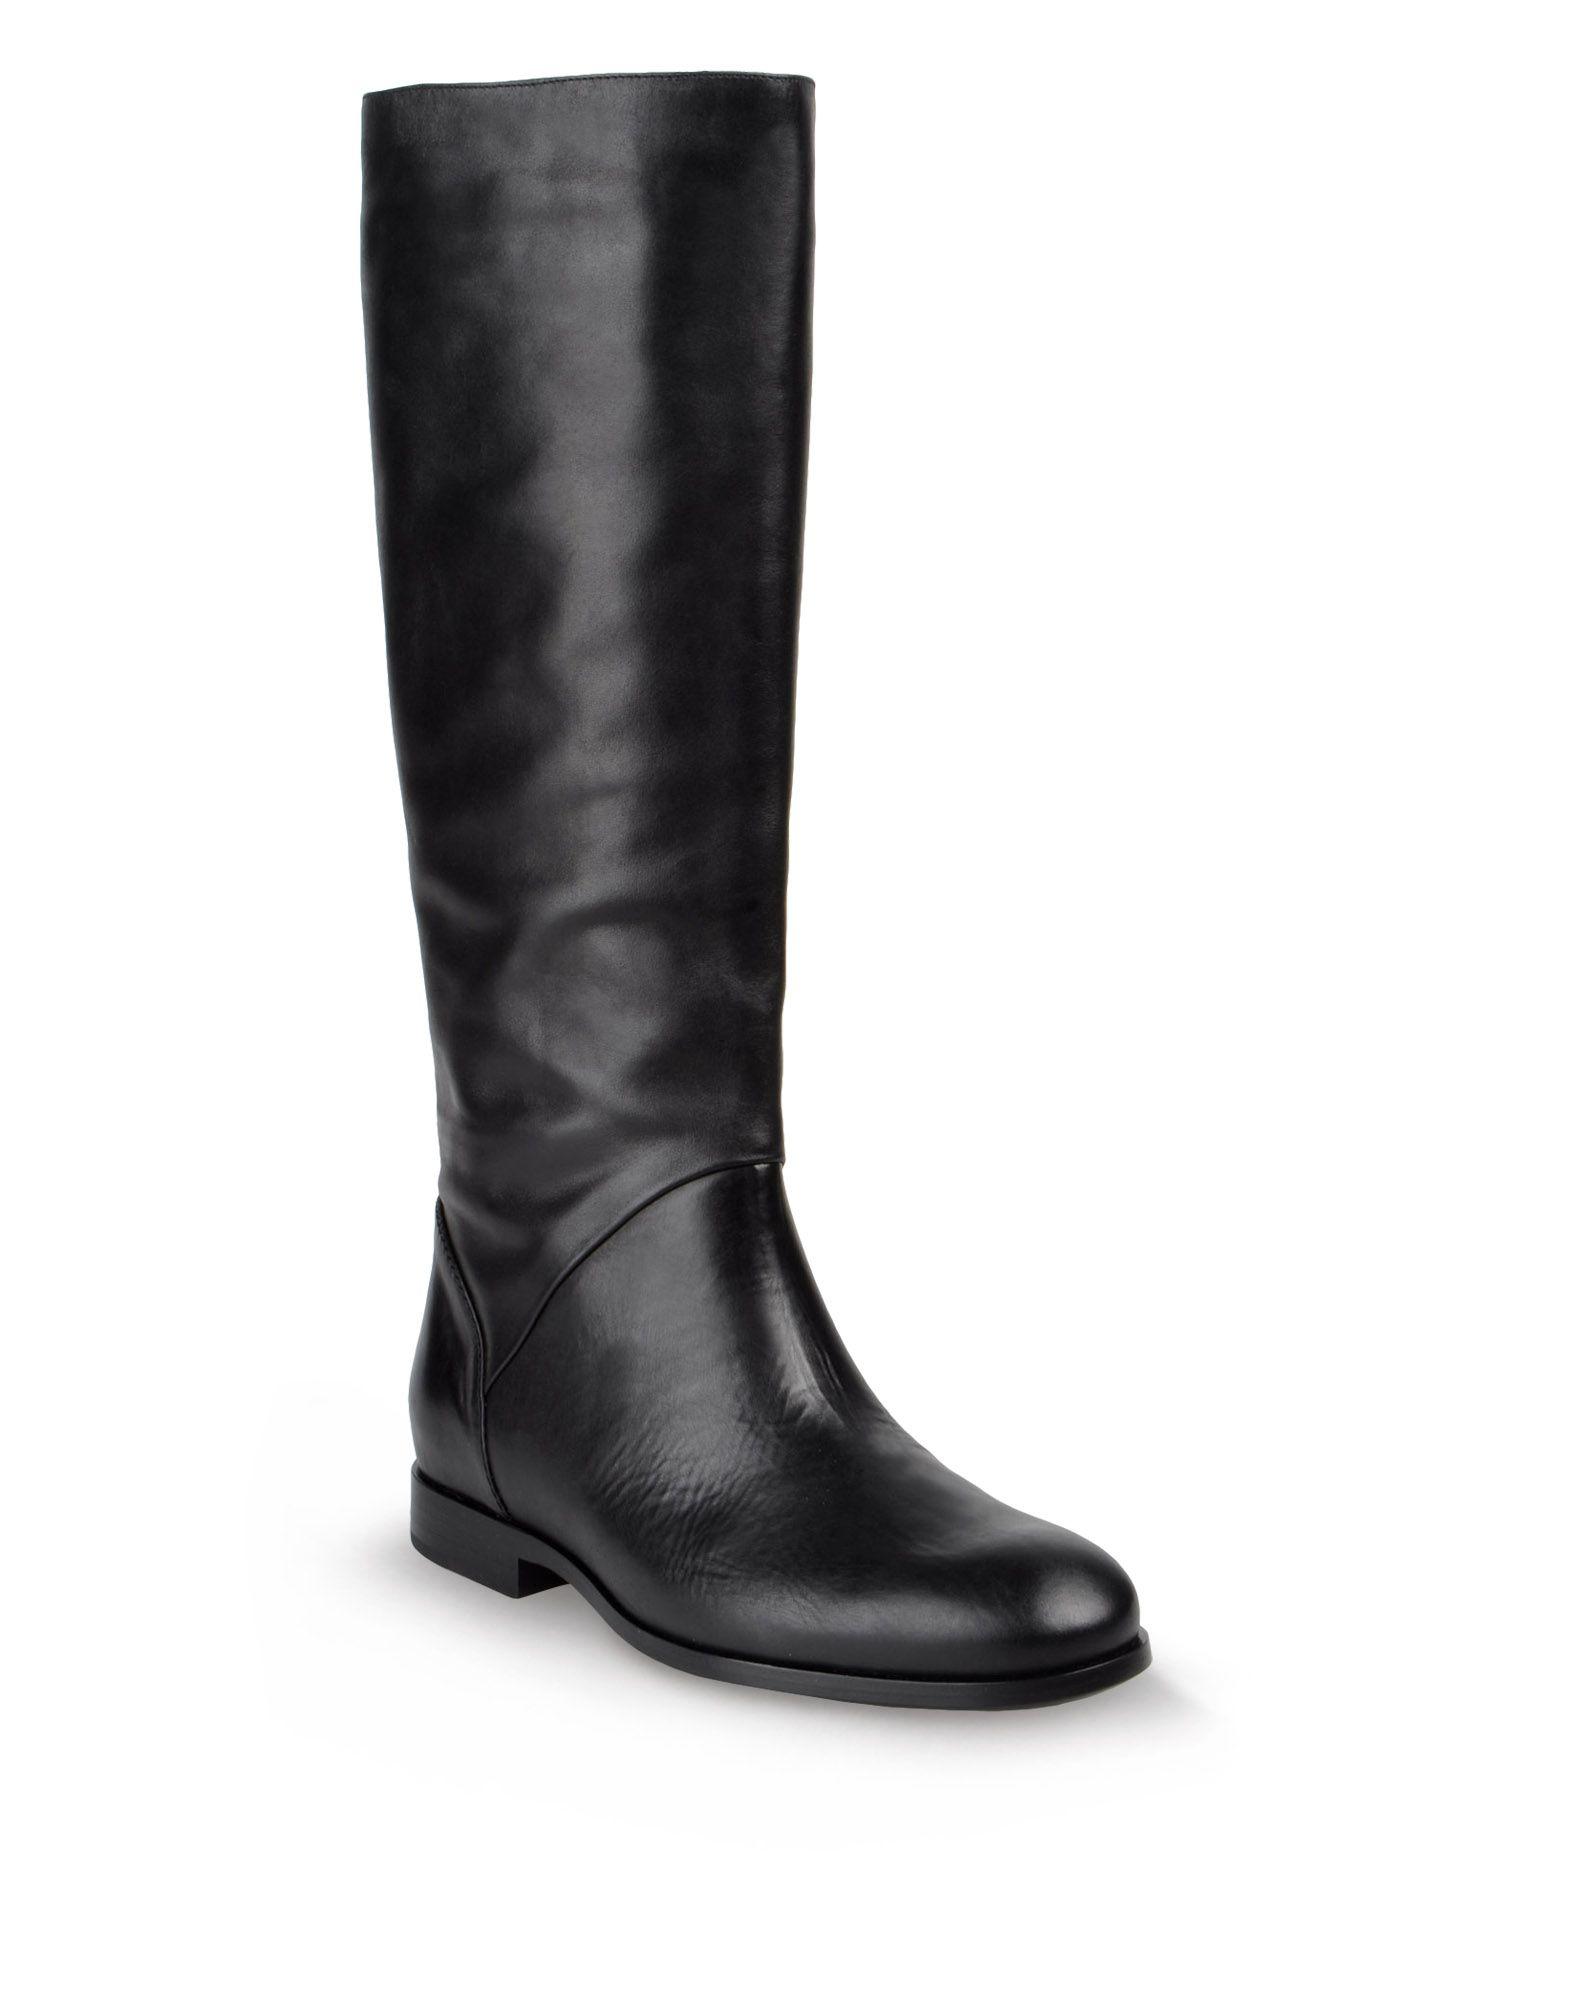 Boots - JIL SANDER NAVY Online Store